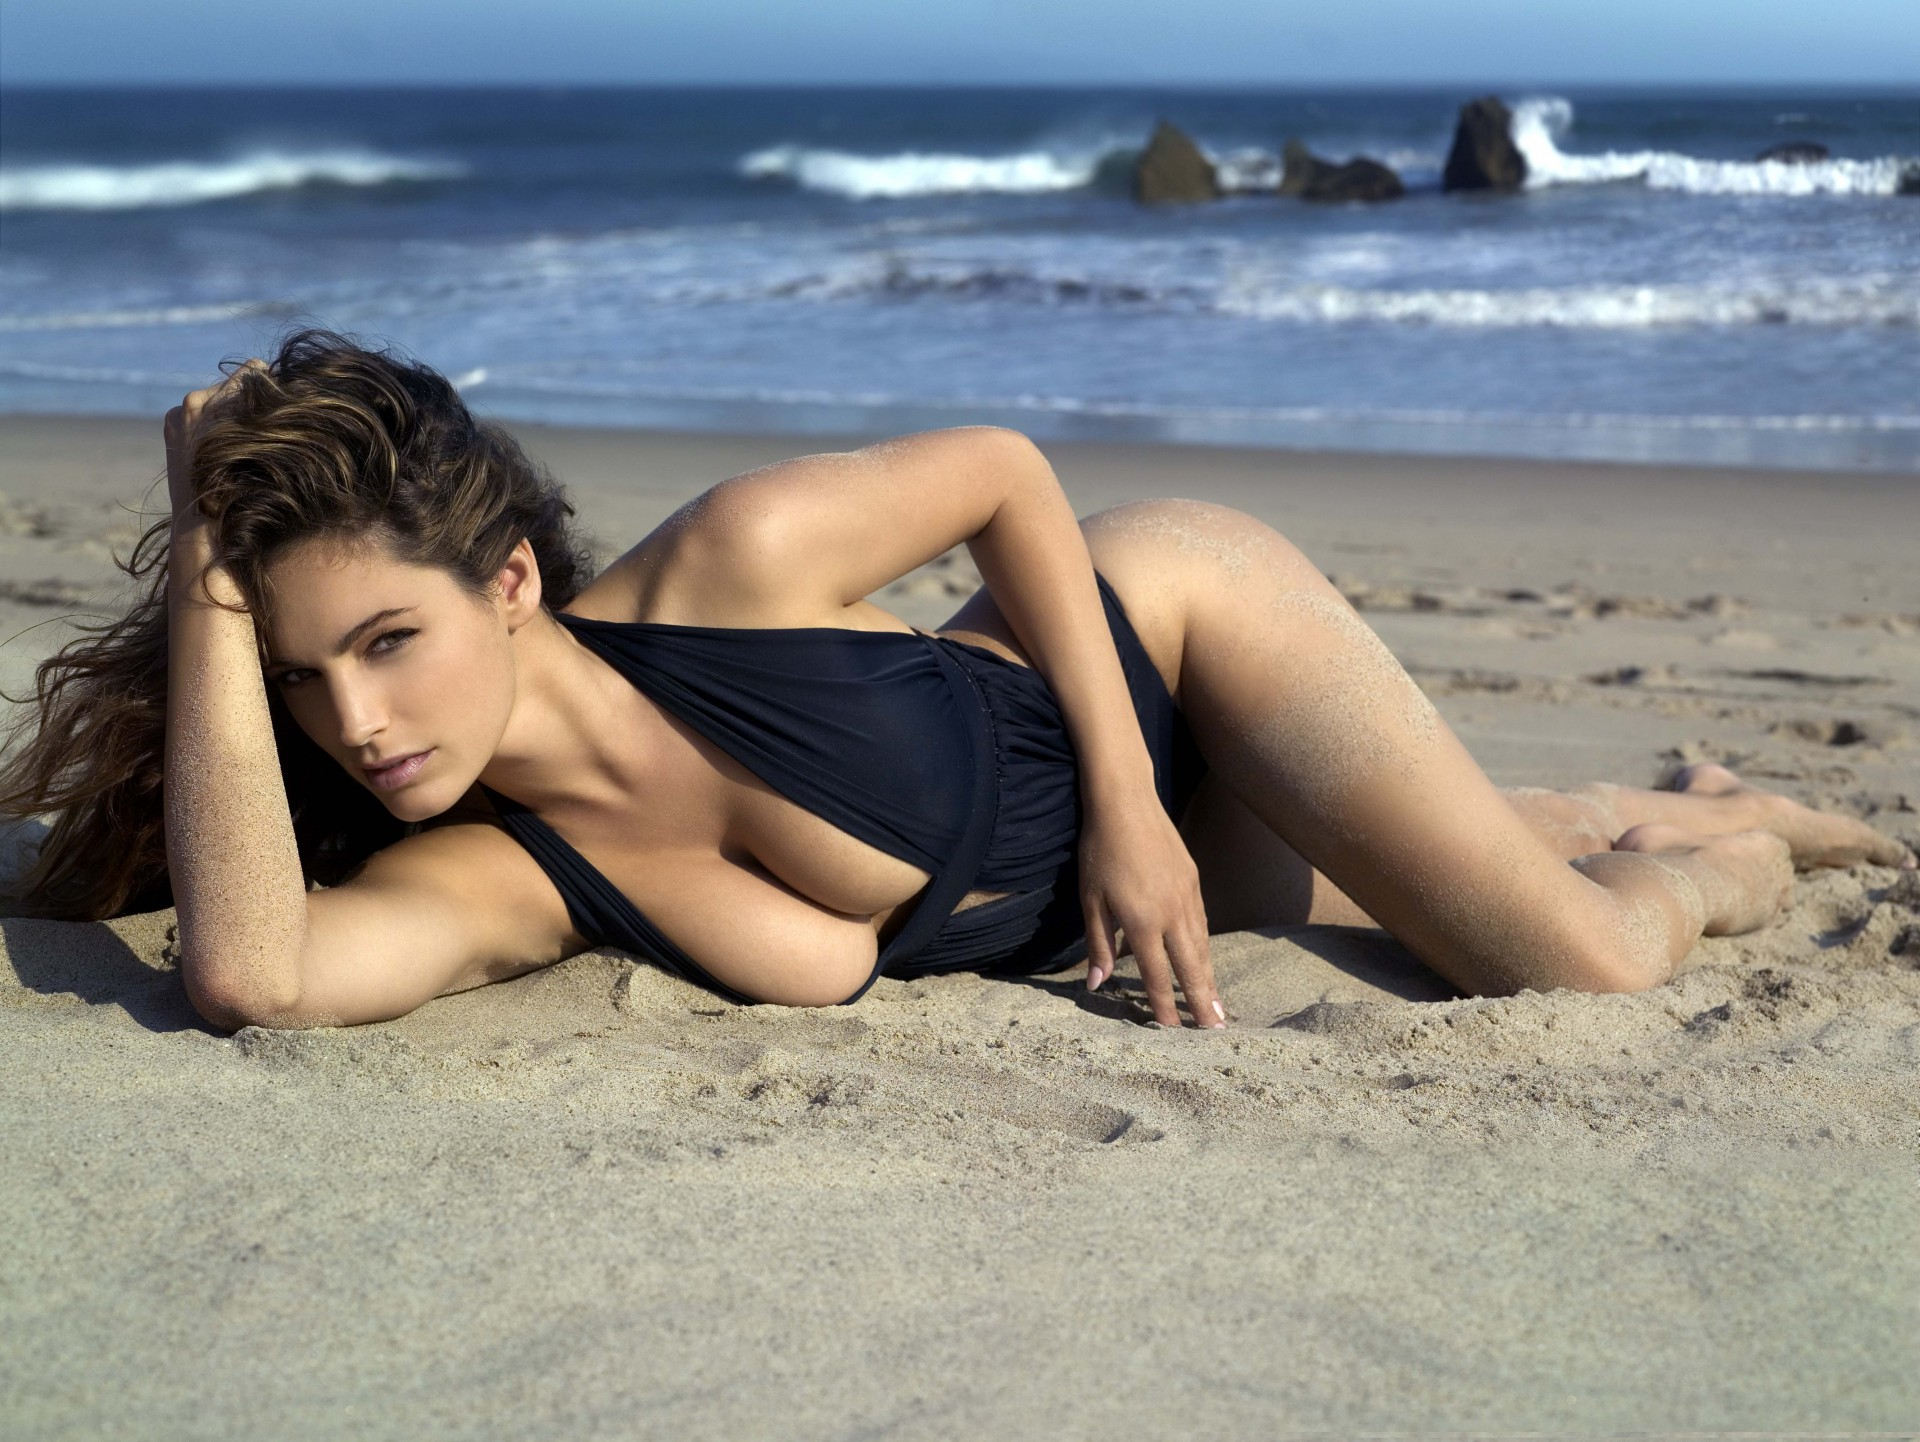 женщина на пляже видео - 5